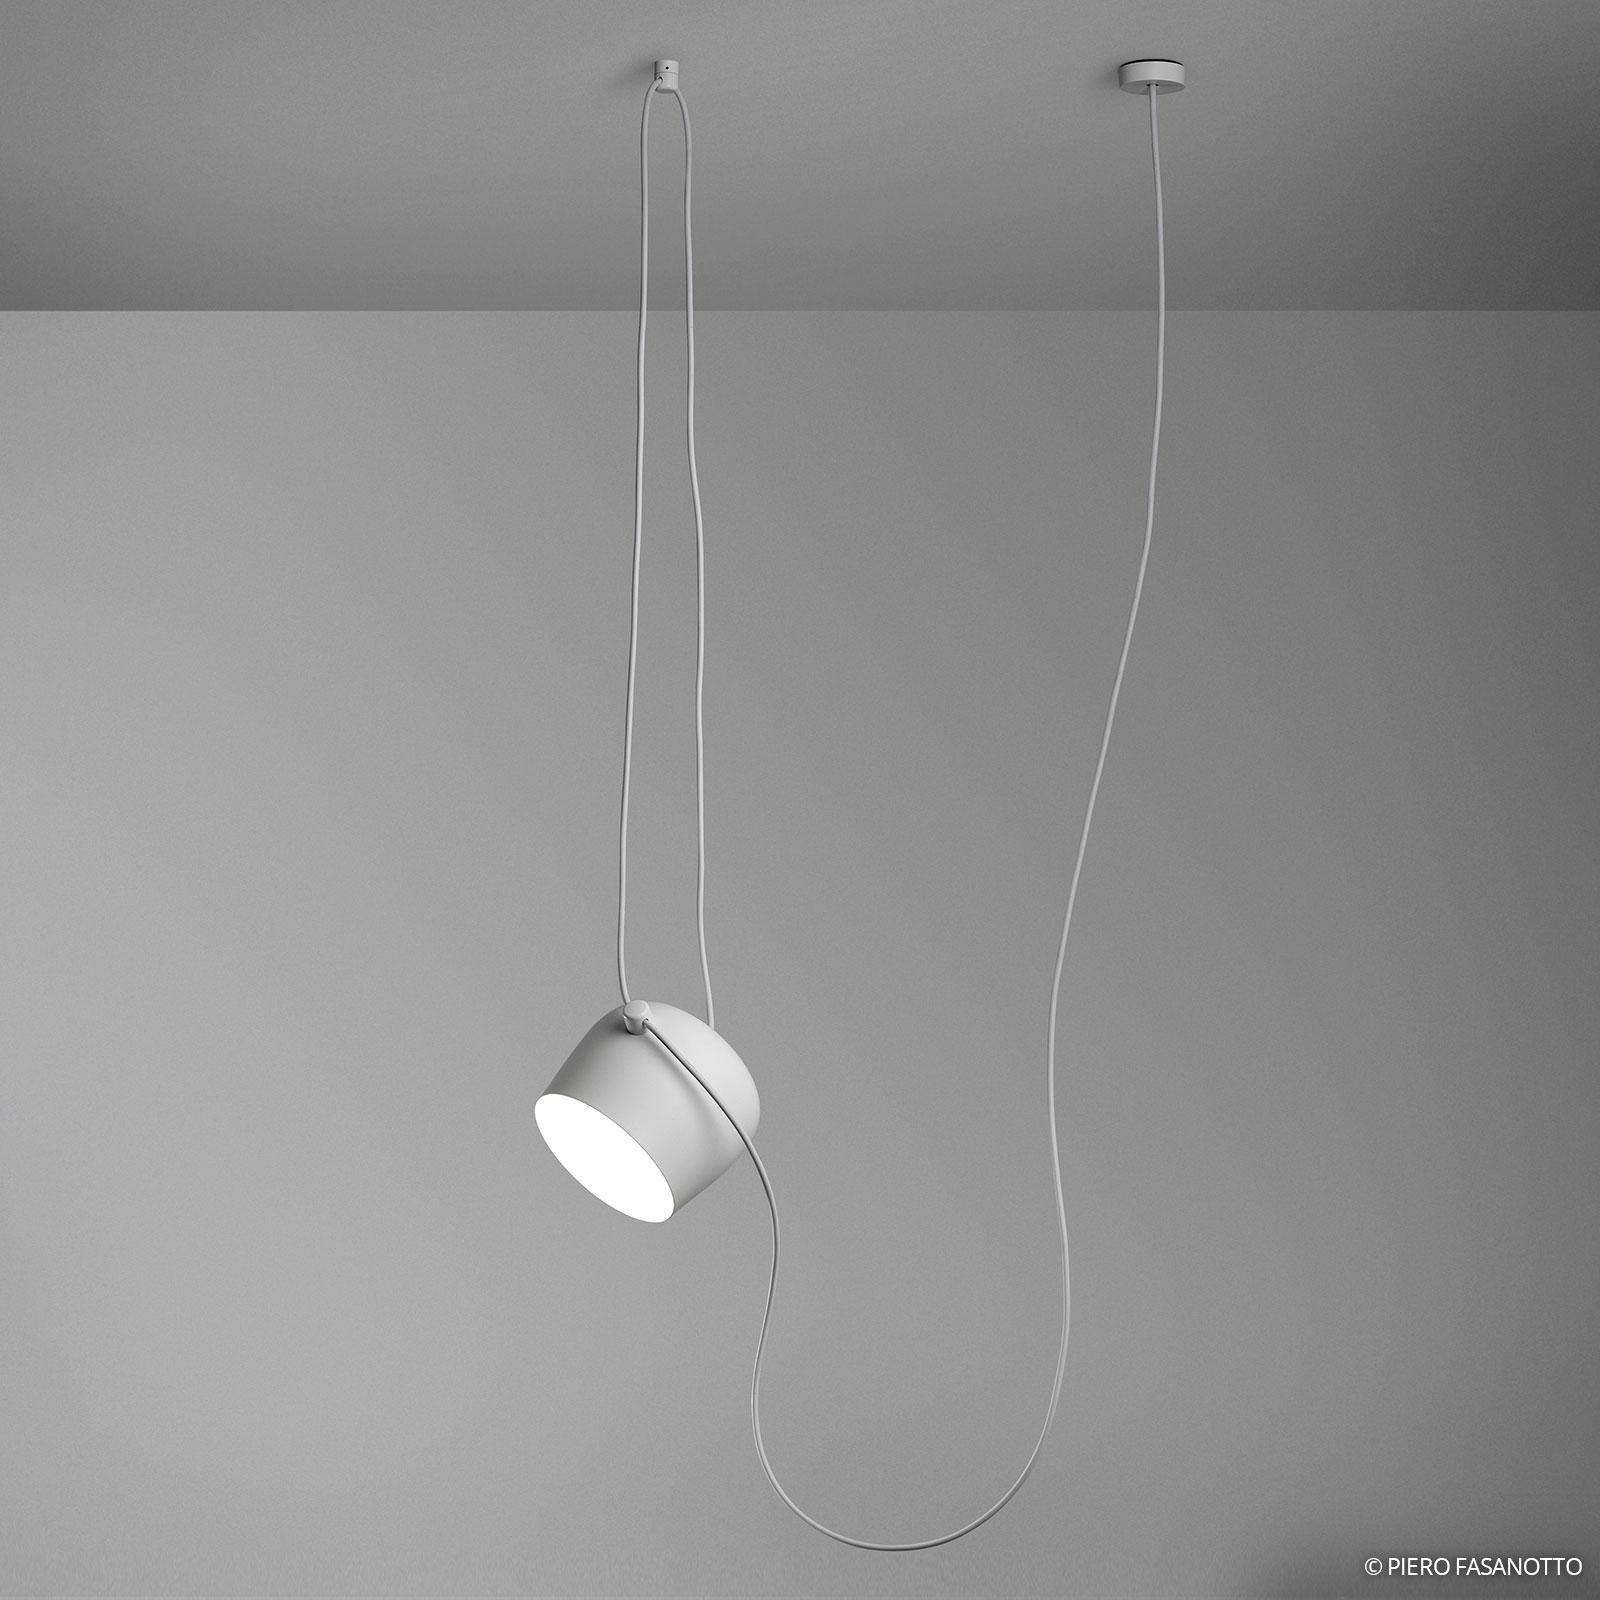 FLOS Aim dizajnérske závesné LED svietidlo biele_3510272_1